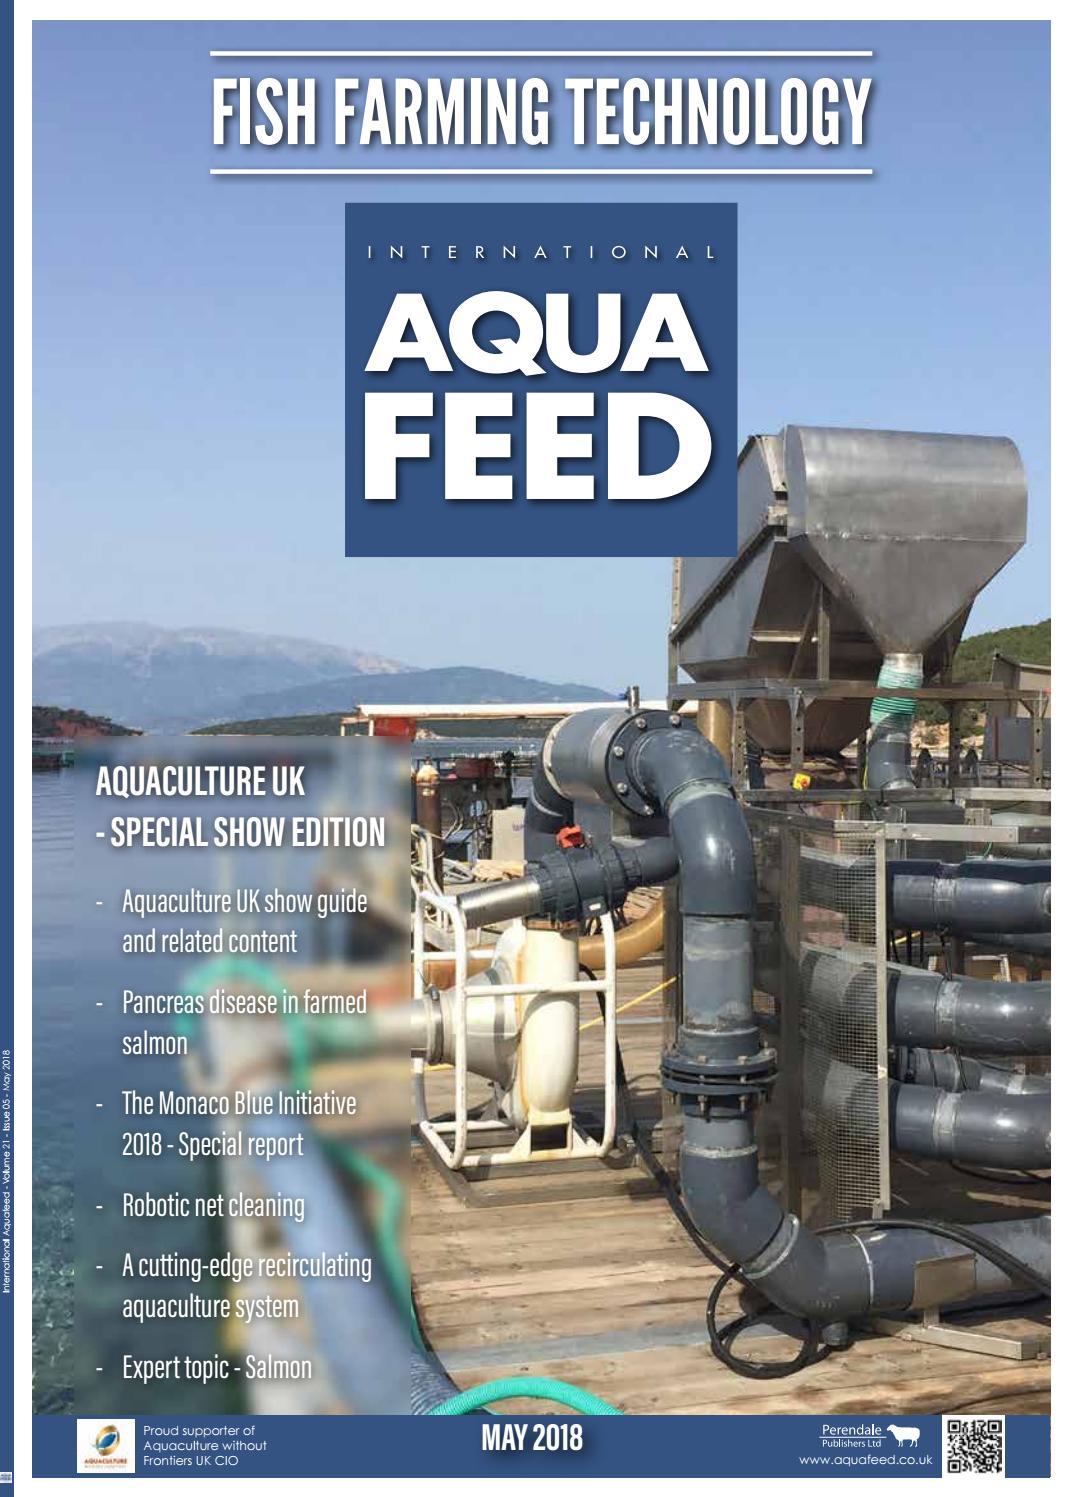 may 2018 international aquafeed magazine by perendale publishers